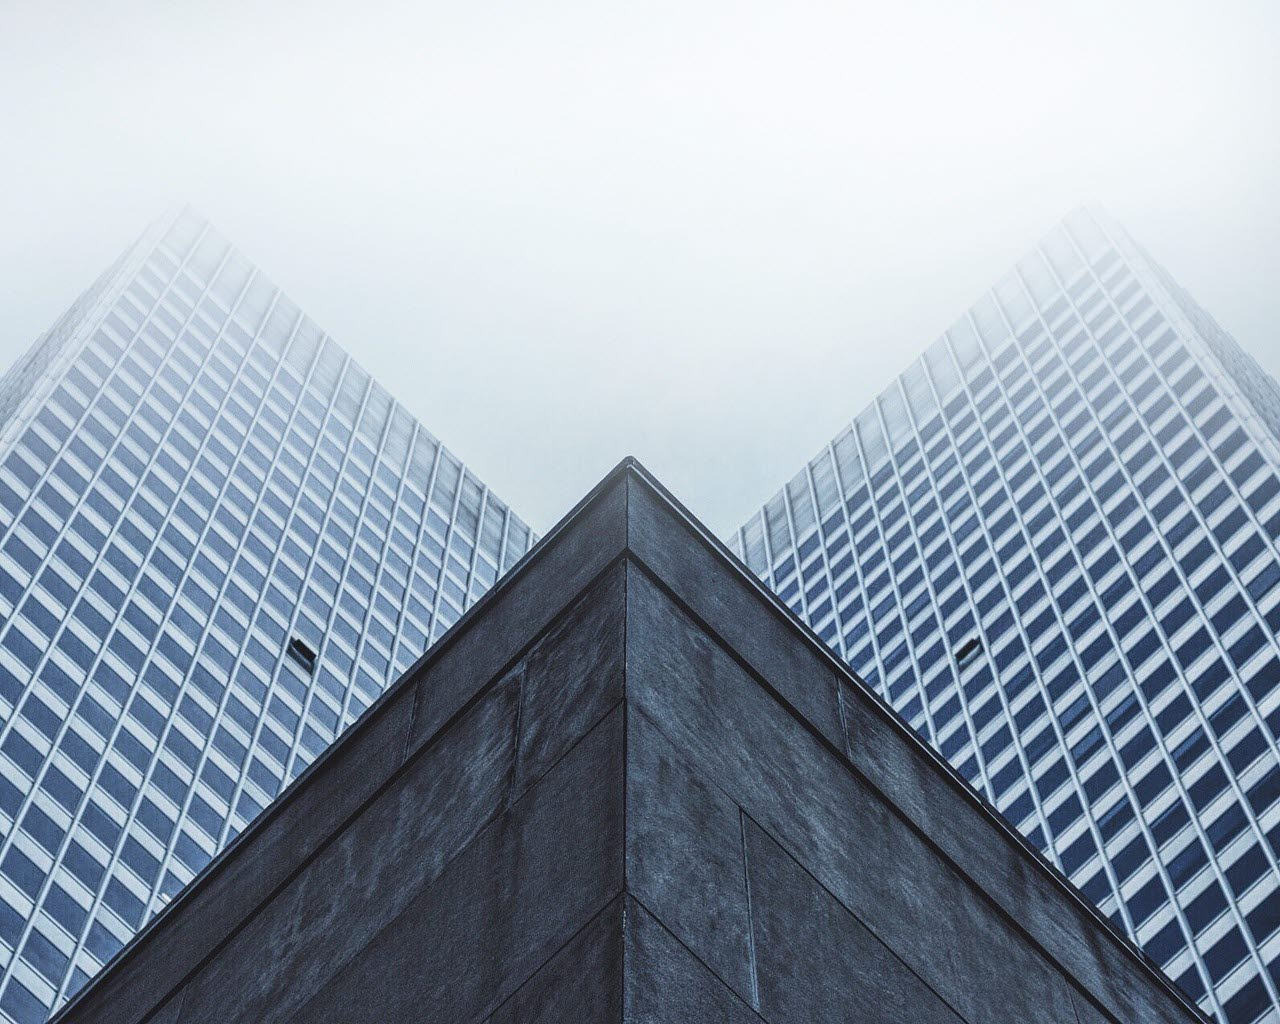 Skyscrapers view from below